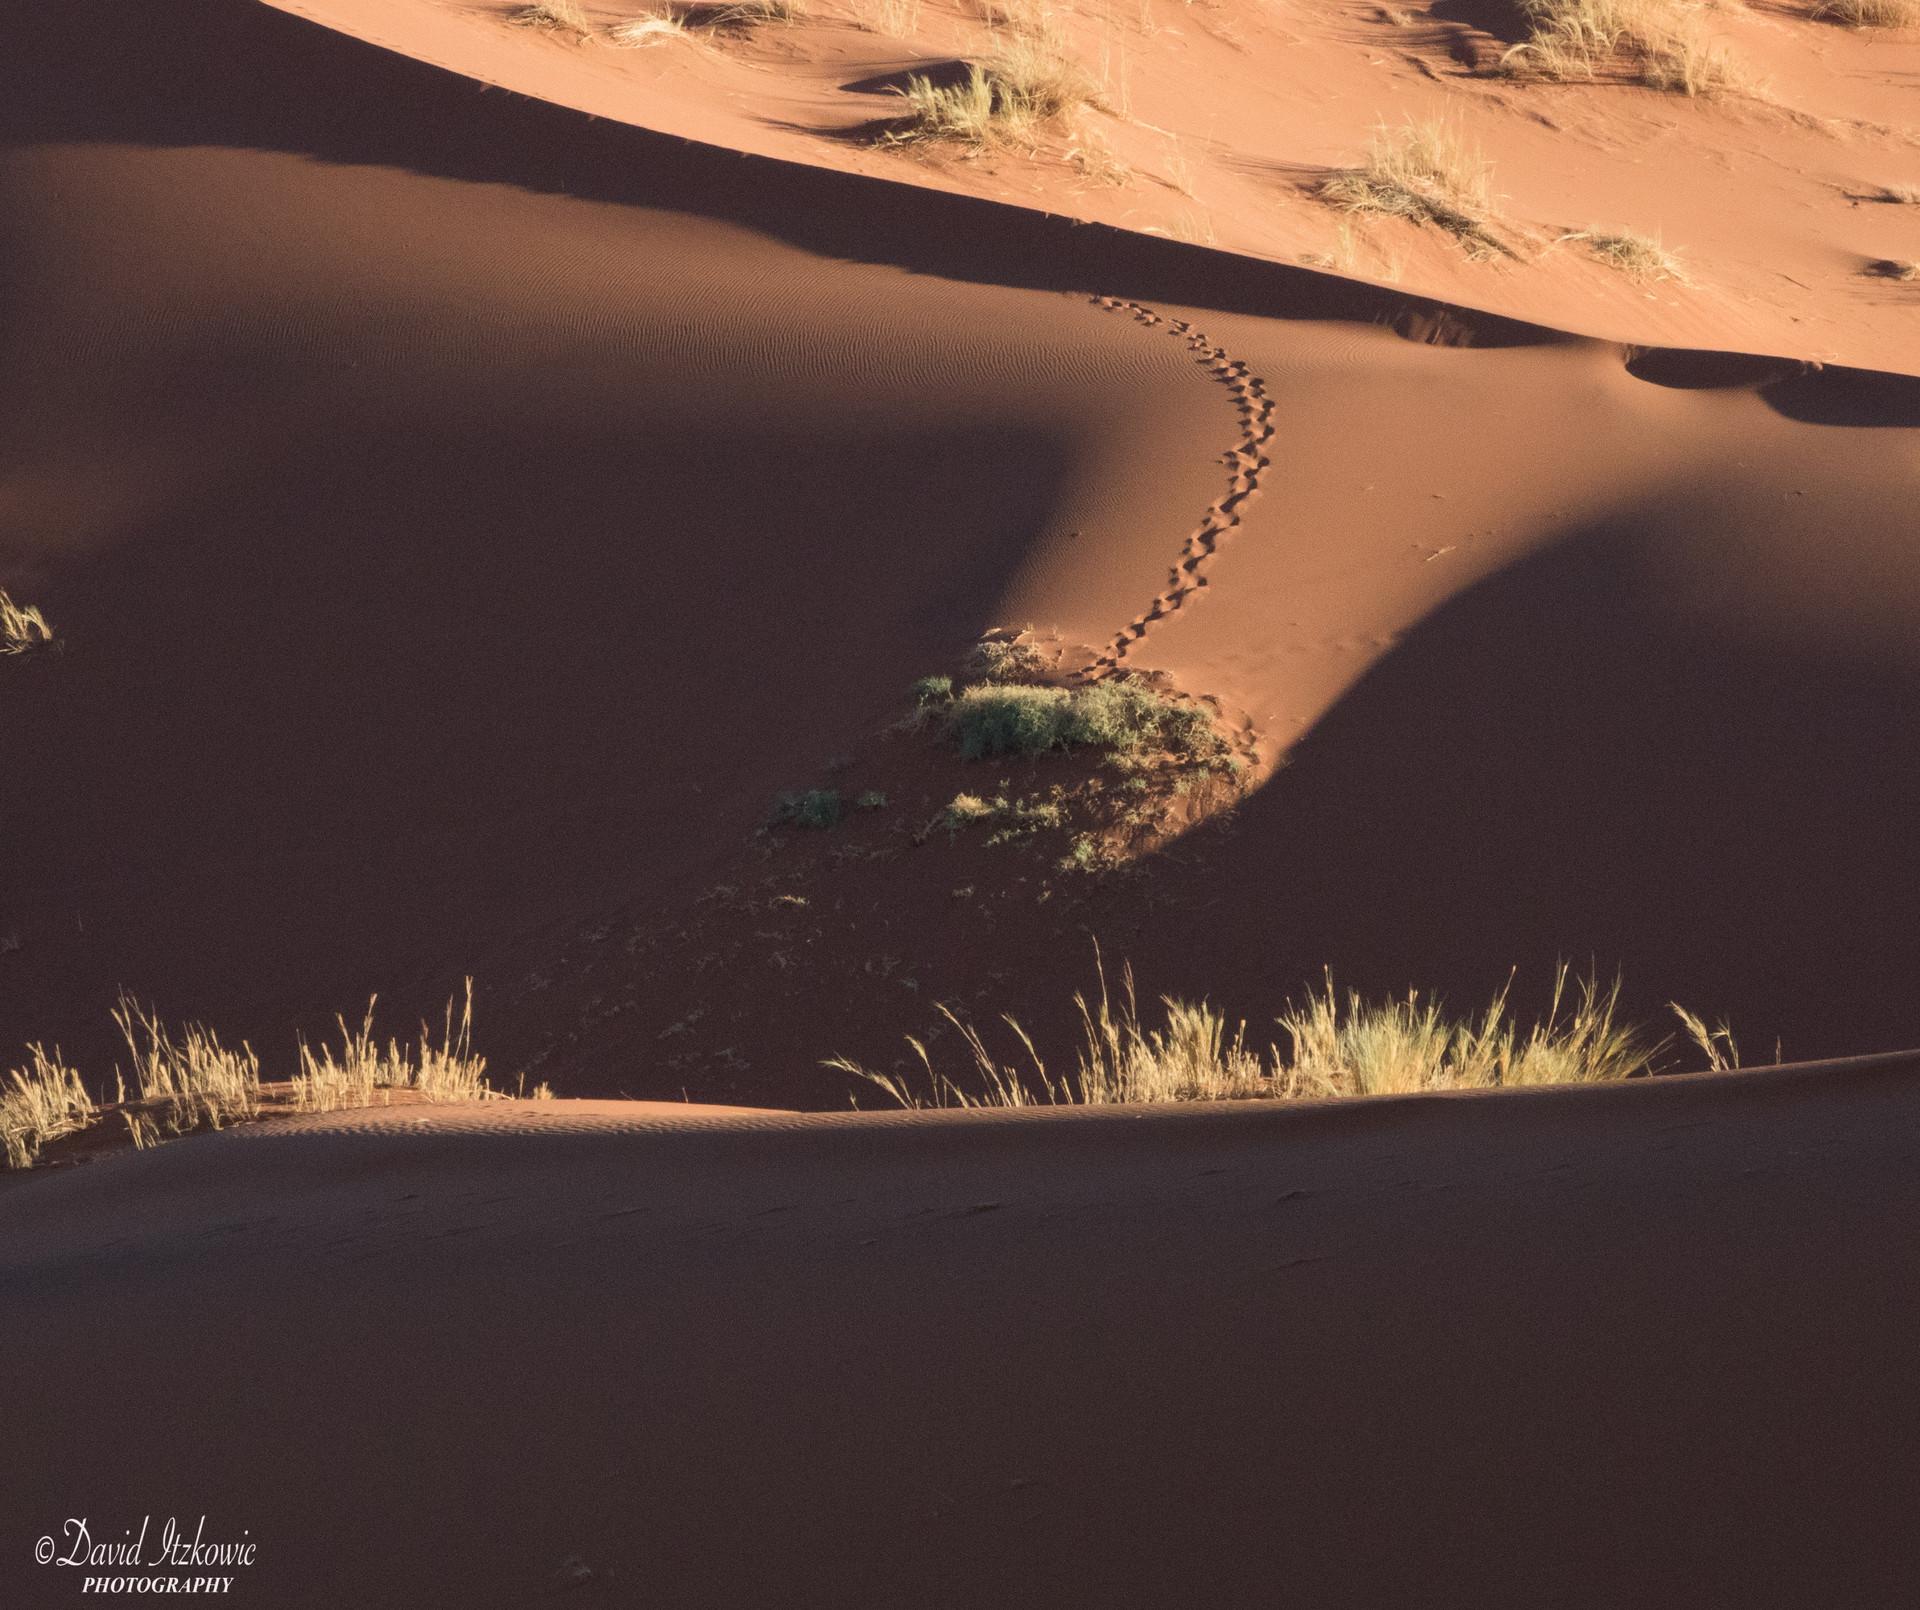 Oryx footprints in the dune